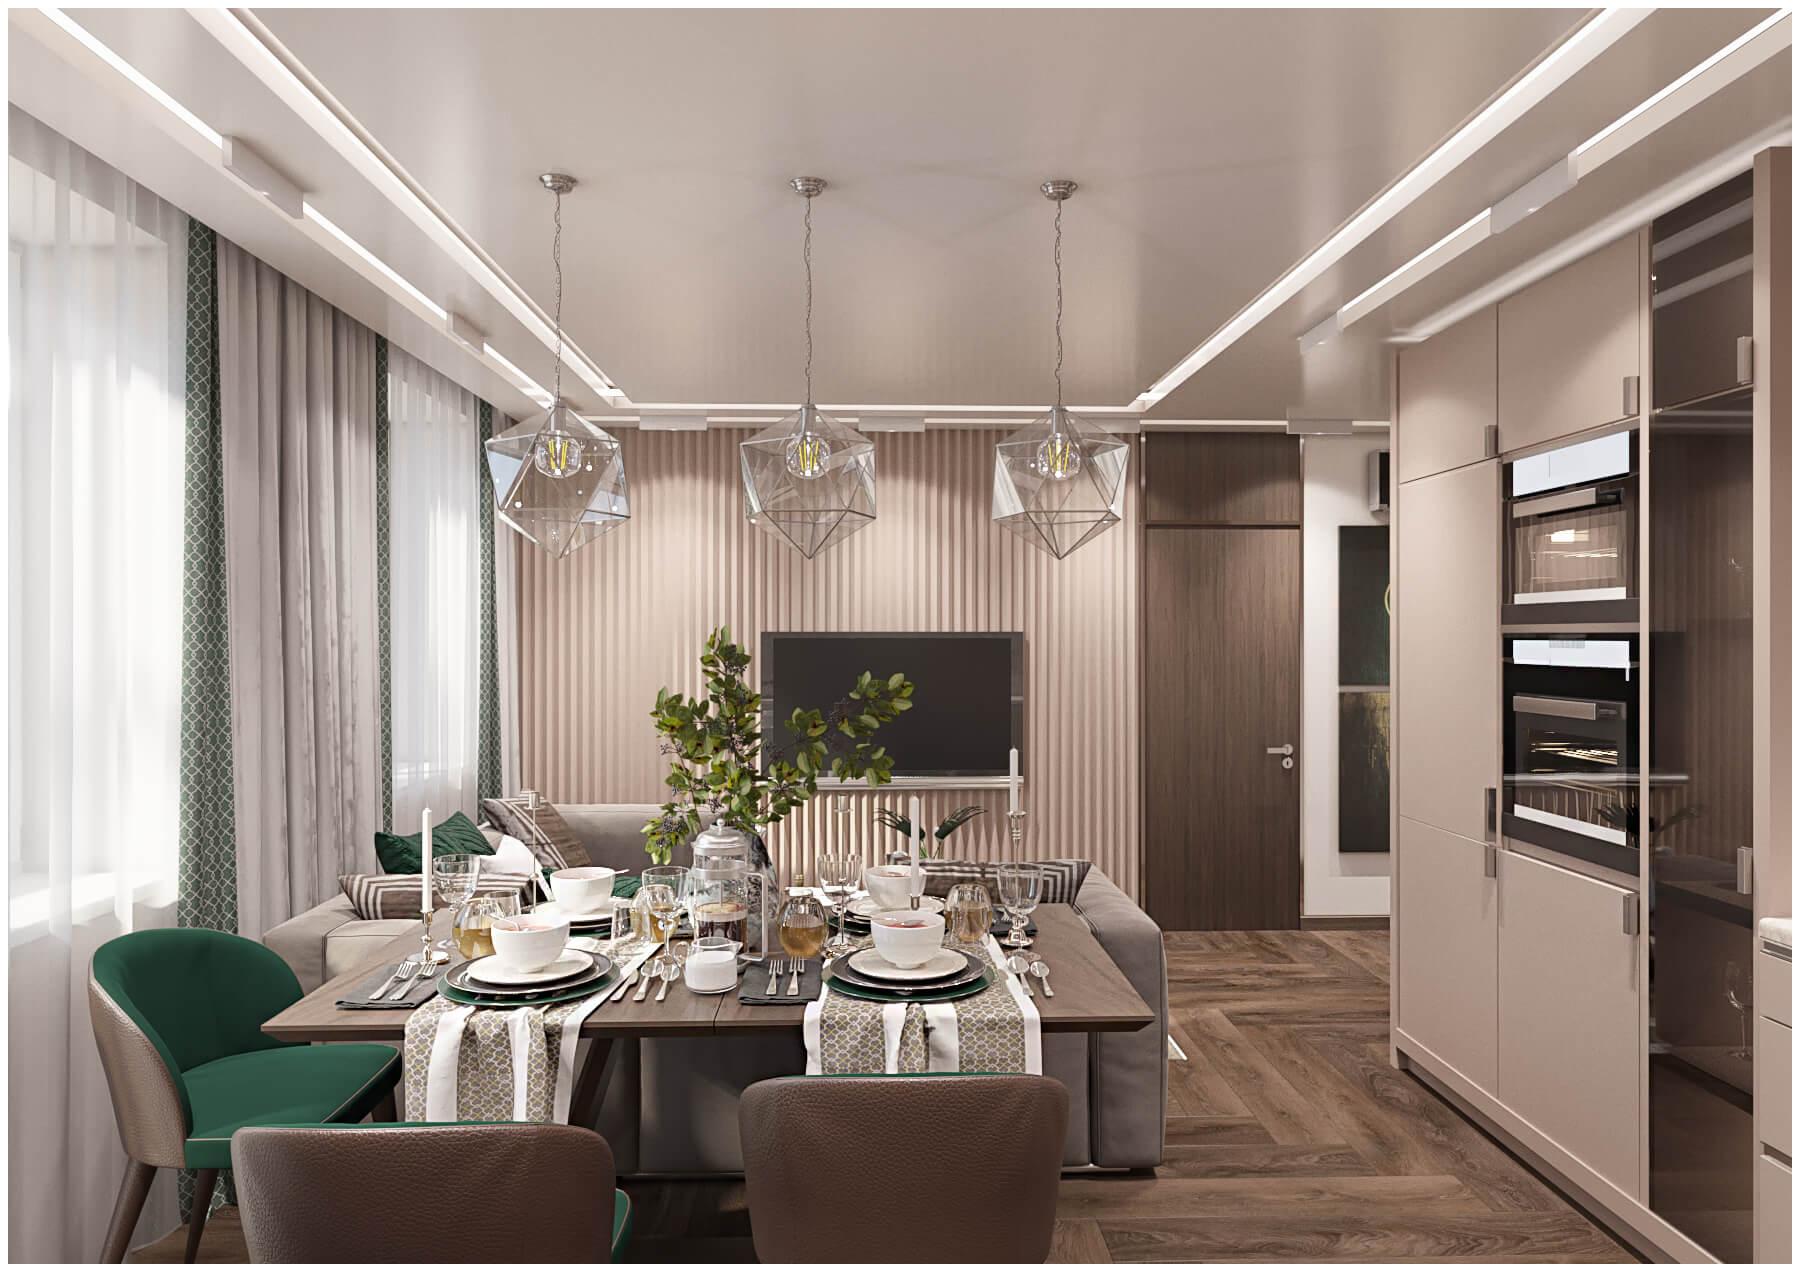 кухня гостиная ракурс5 дизайн студия Tatyana жykova